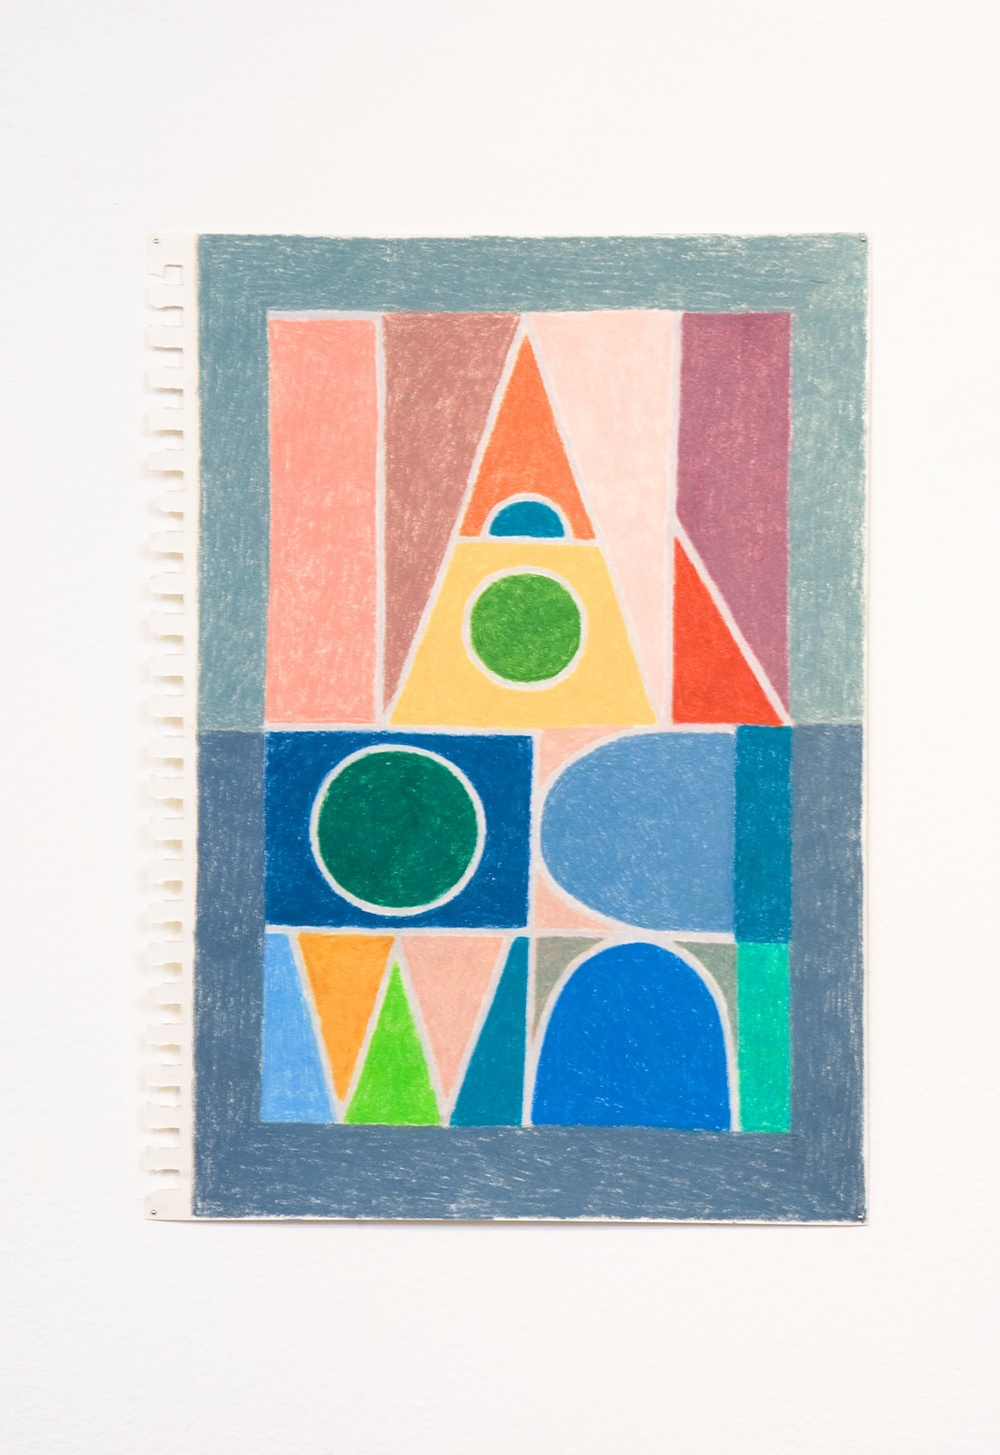 Elijah Burgher  Kaspar Hauser  2009 Colored pencil on paper 12h x 8w in EB002